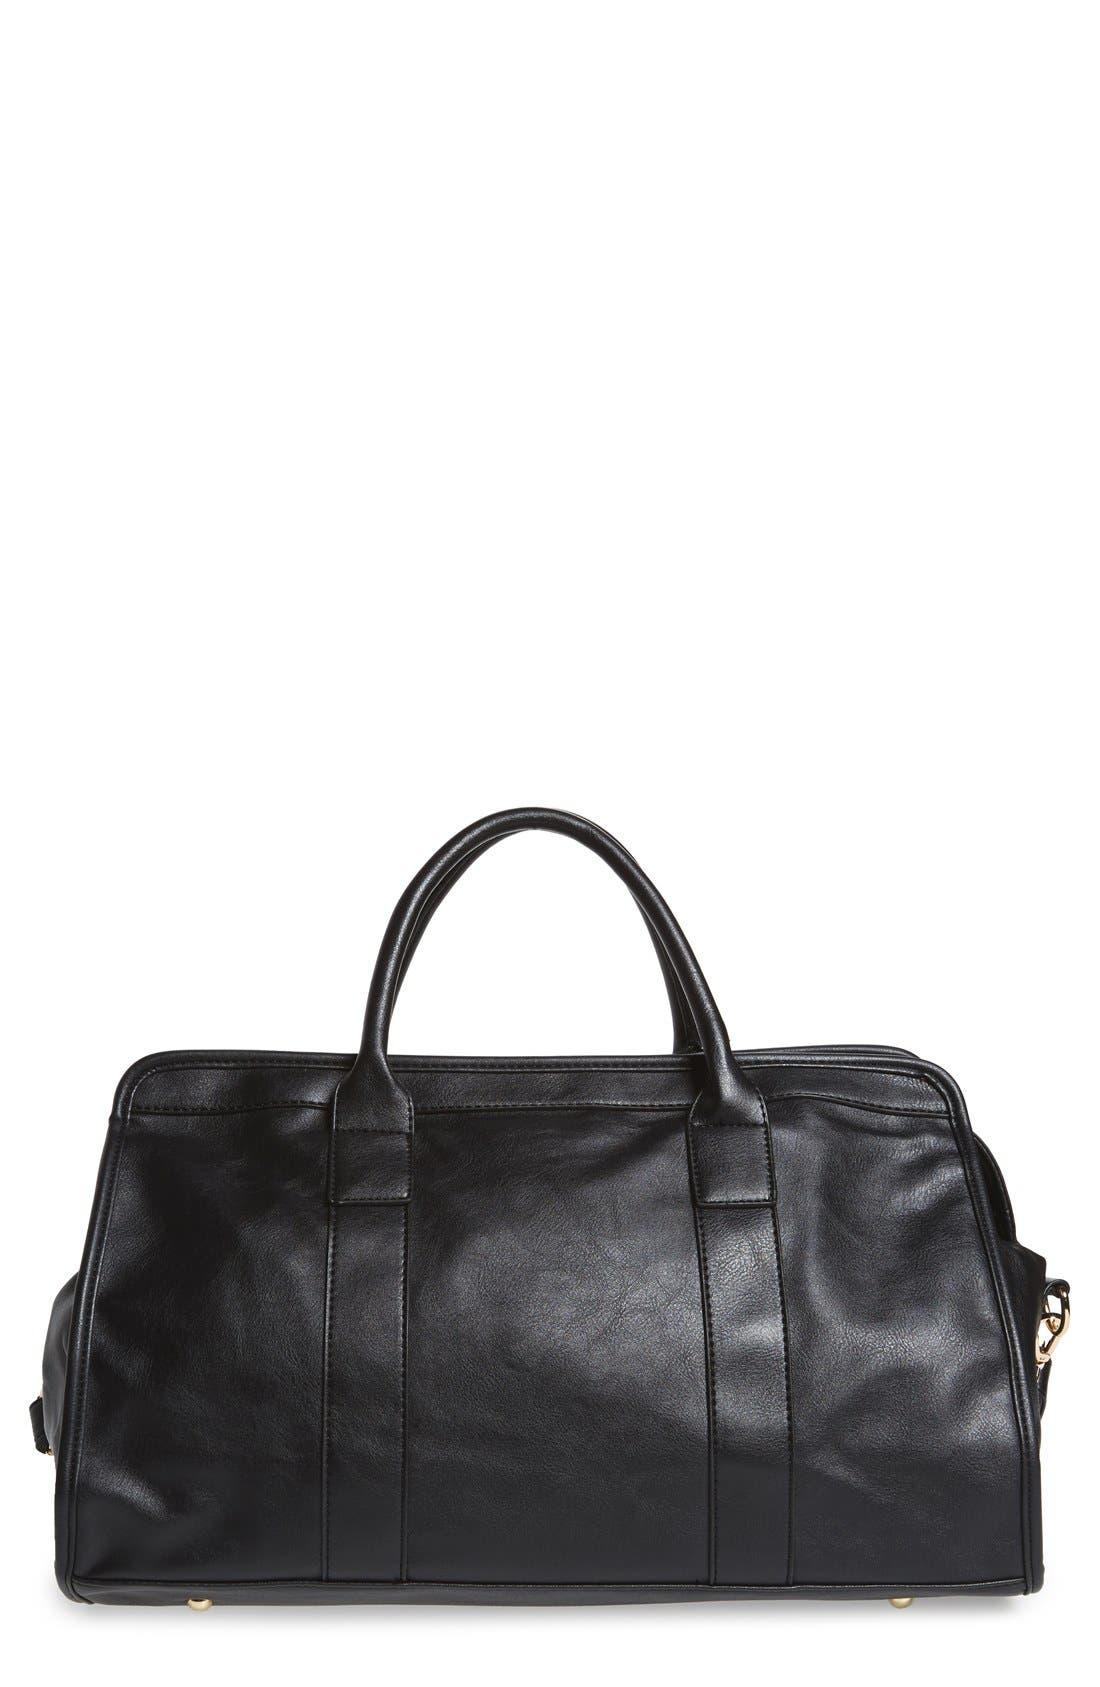 Alternate Image 1 Selected - NU-G Faux Leather Overnighter Bag